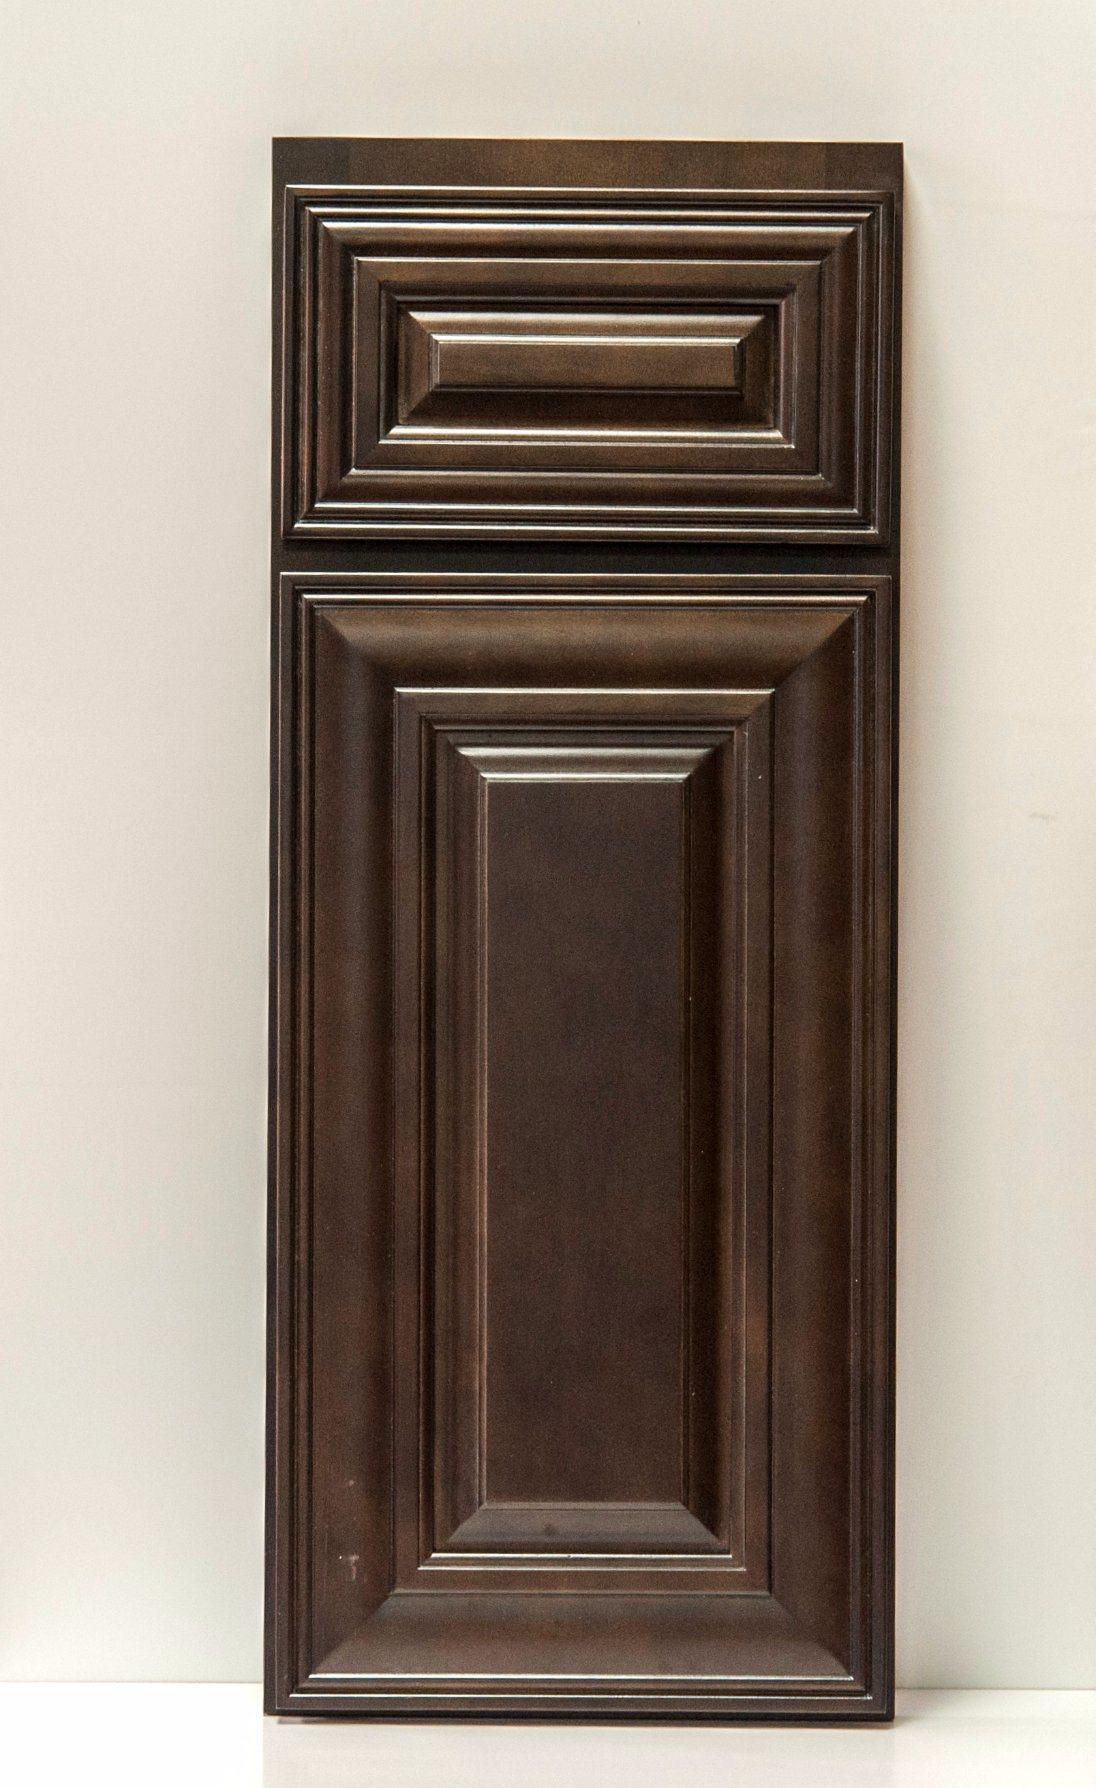 America Framed Frameless Solid Rta PVC Themol Foil White Shaker HPL China Wood Kitchen Cabinet - China Solid Wood Cabinet, Rta Kitchen Cabinet